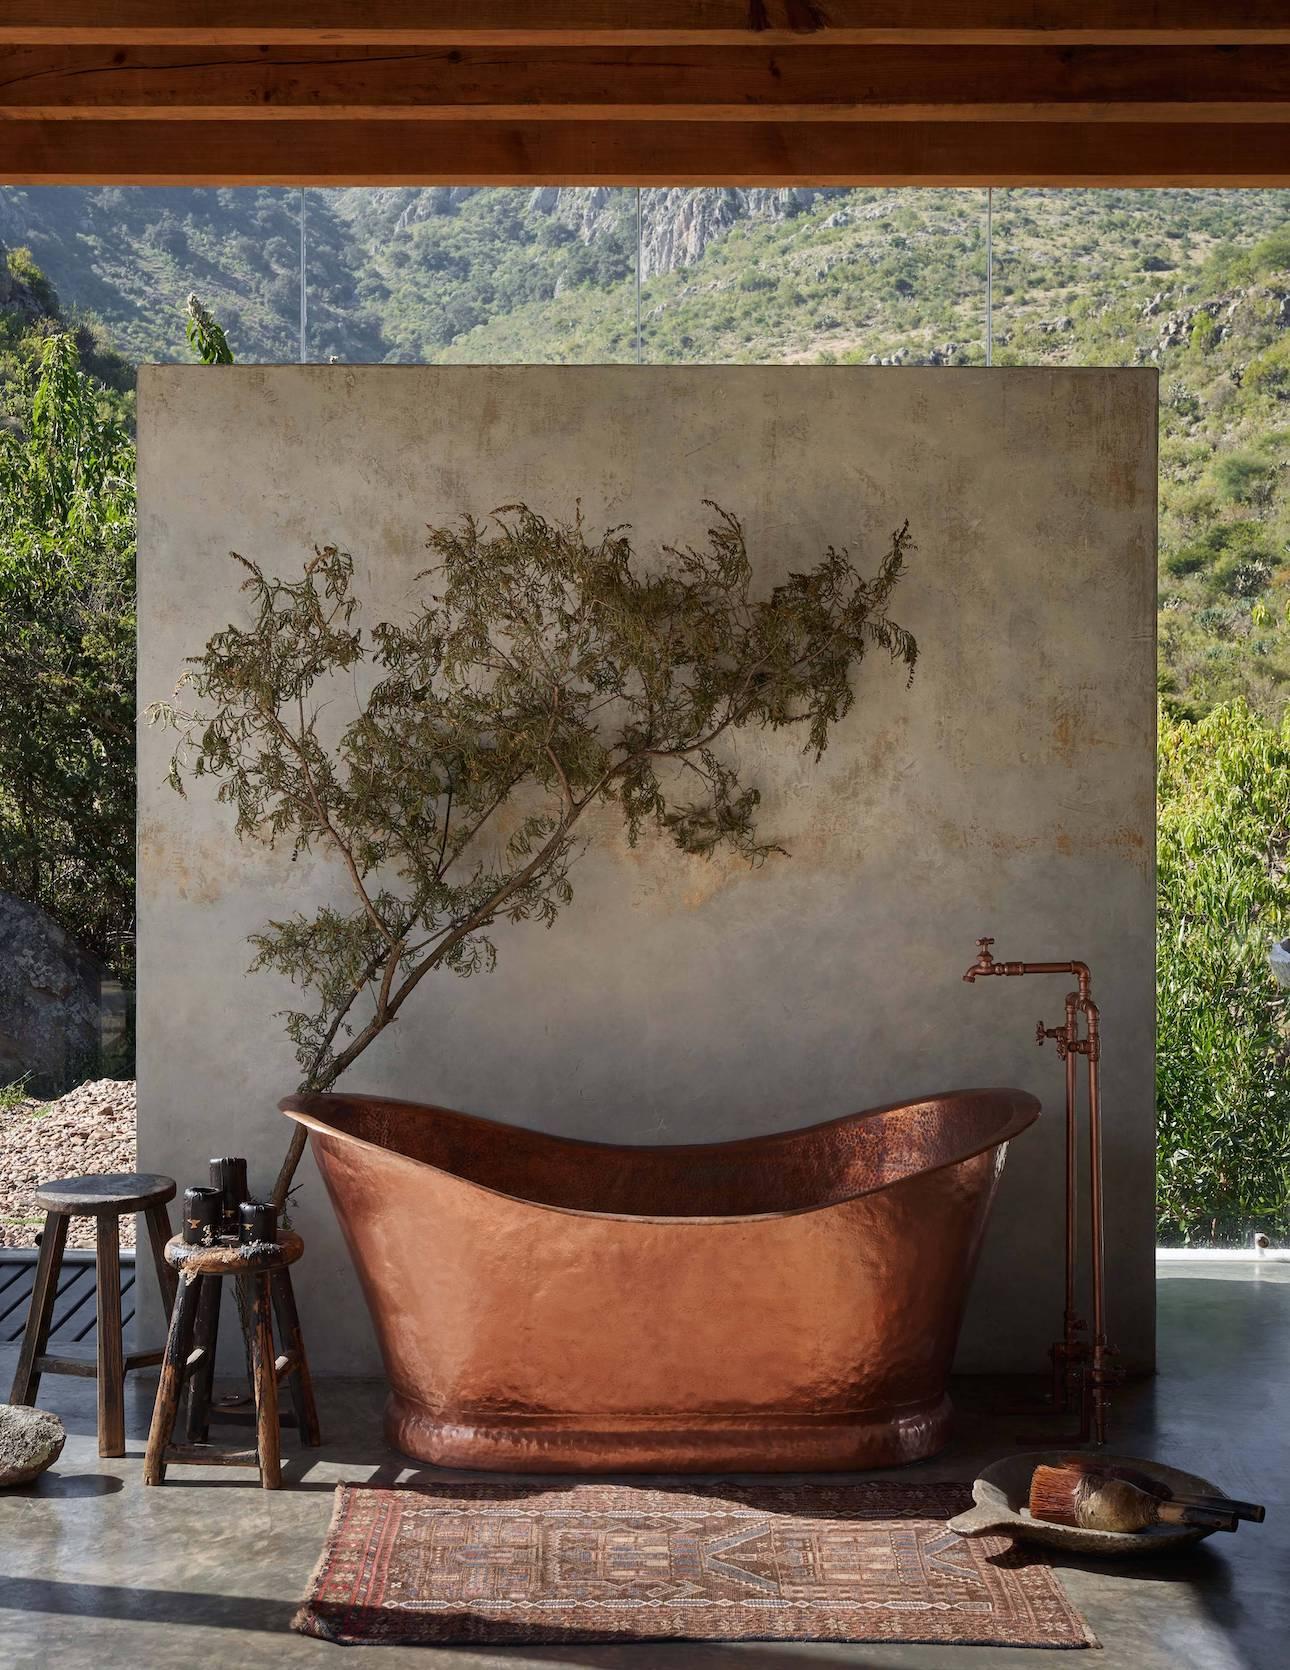 The property has a stunning copper bathtub.